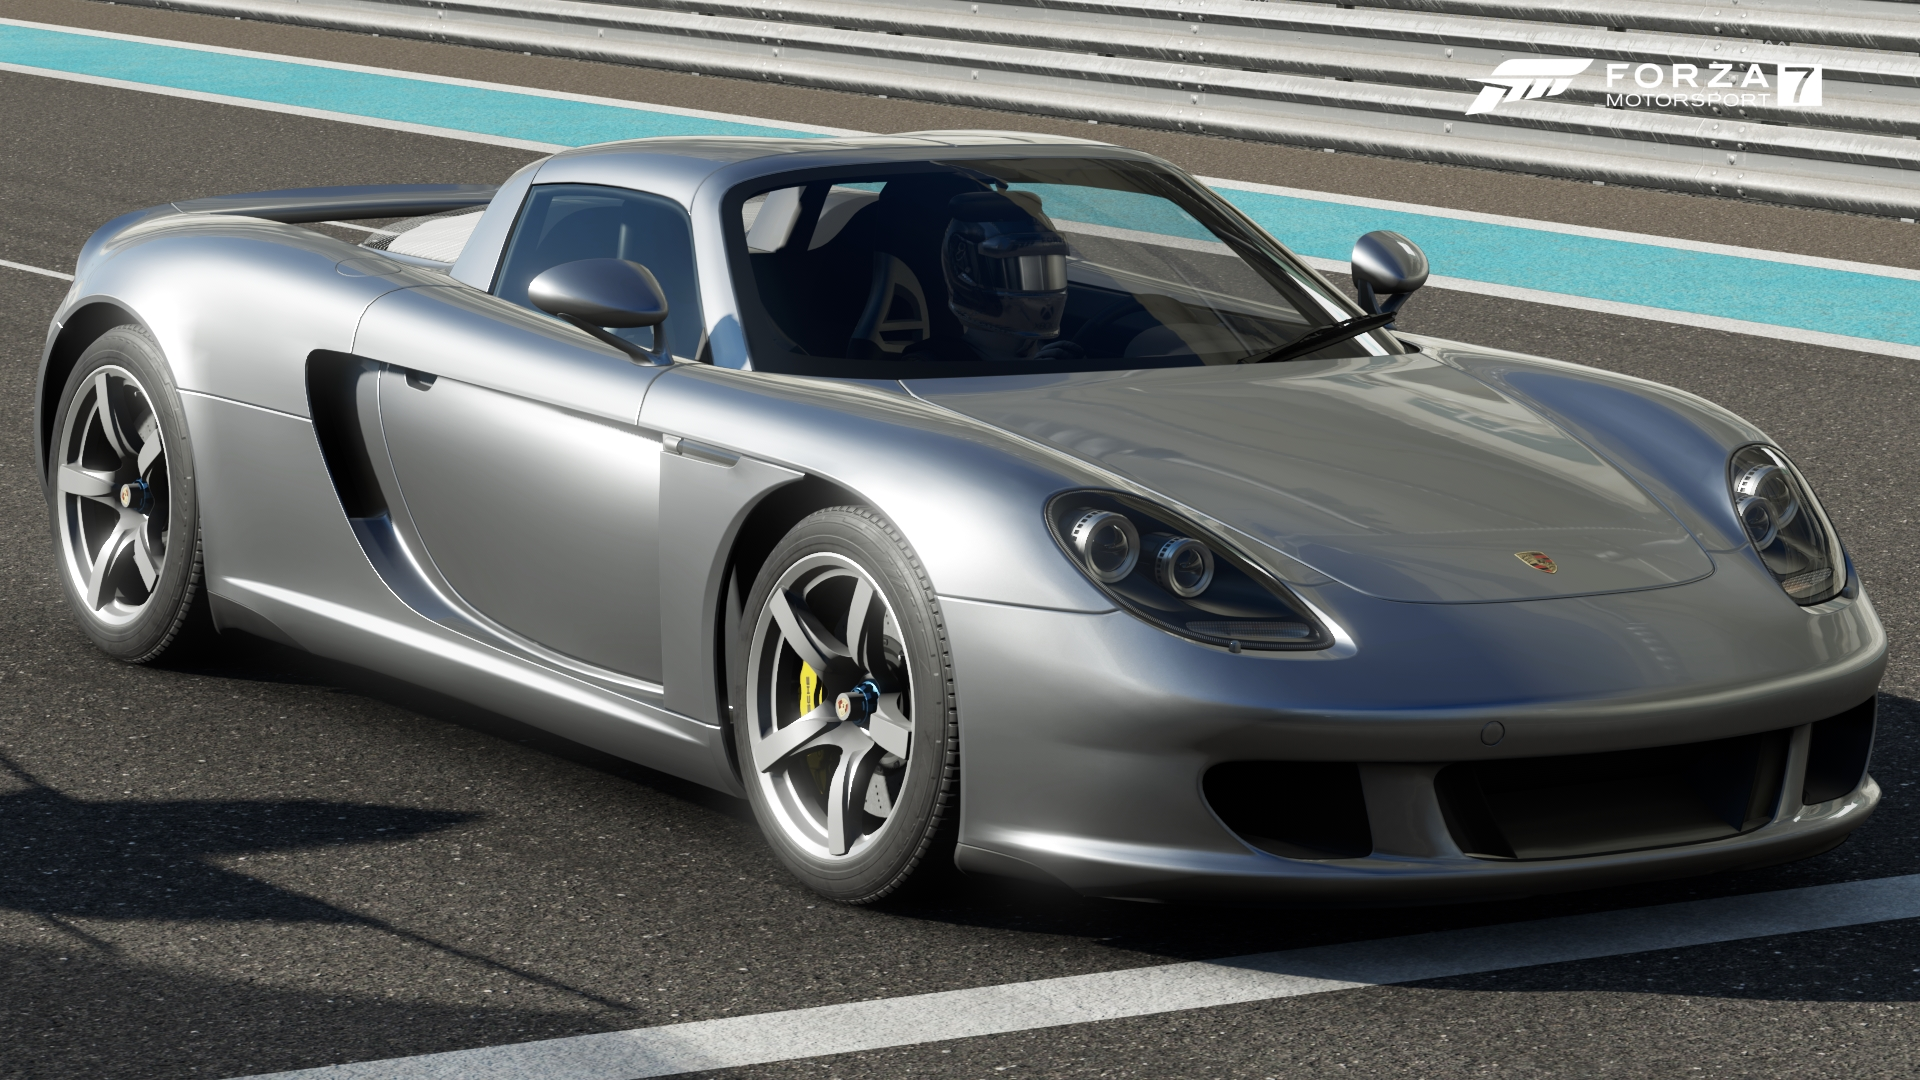 Porsche Carrera GT   Forza Motorsport Wiki   FANDOM powered by Wikia